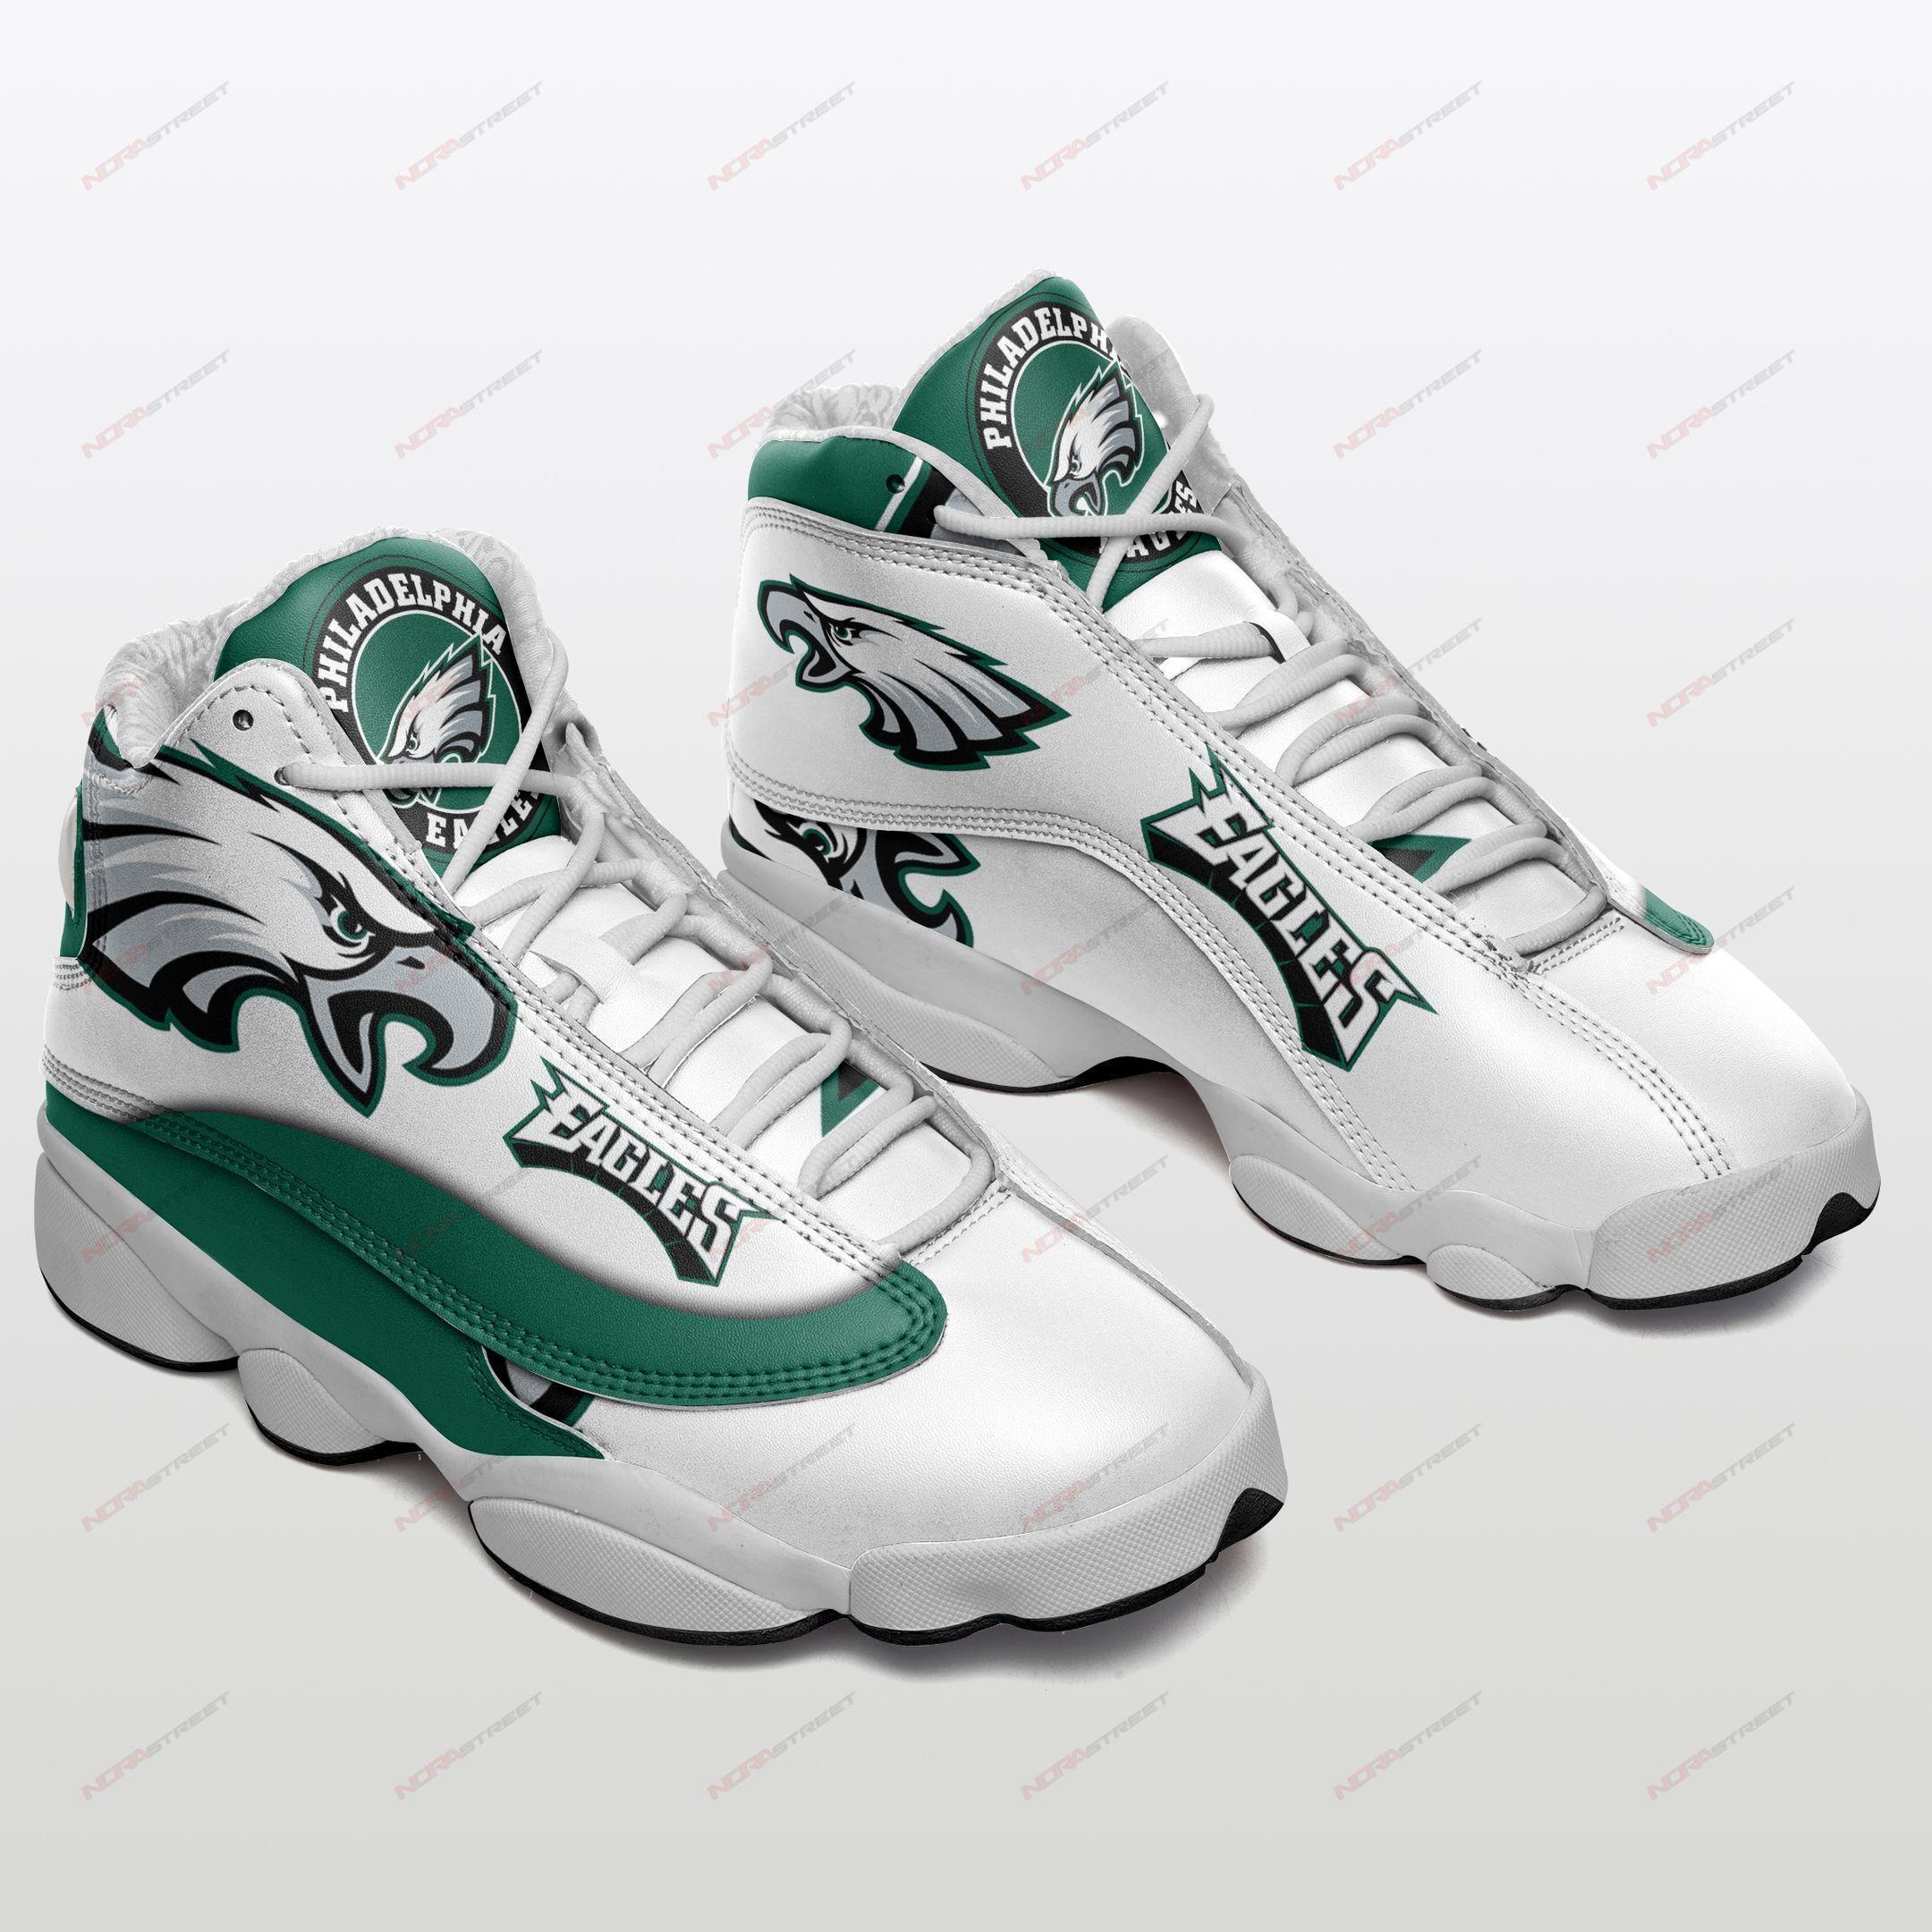 Philadelphia Eagles Air Jordan 13 Sneakers Sport Shoes